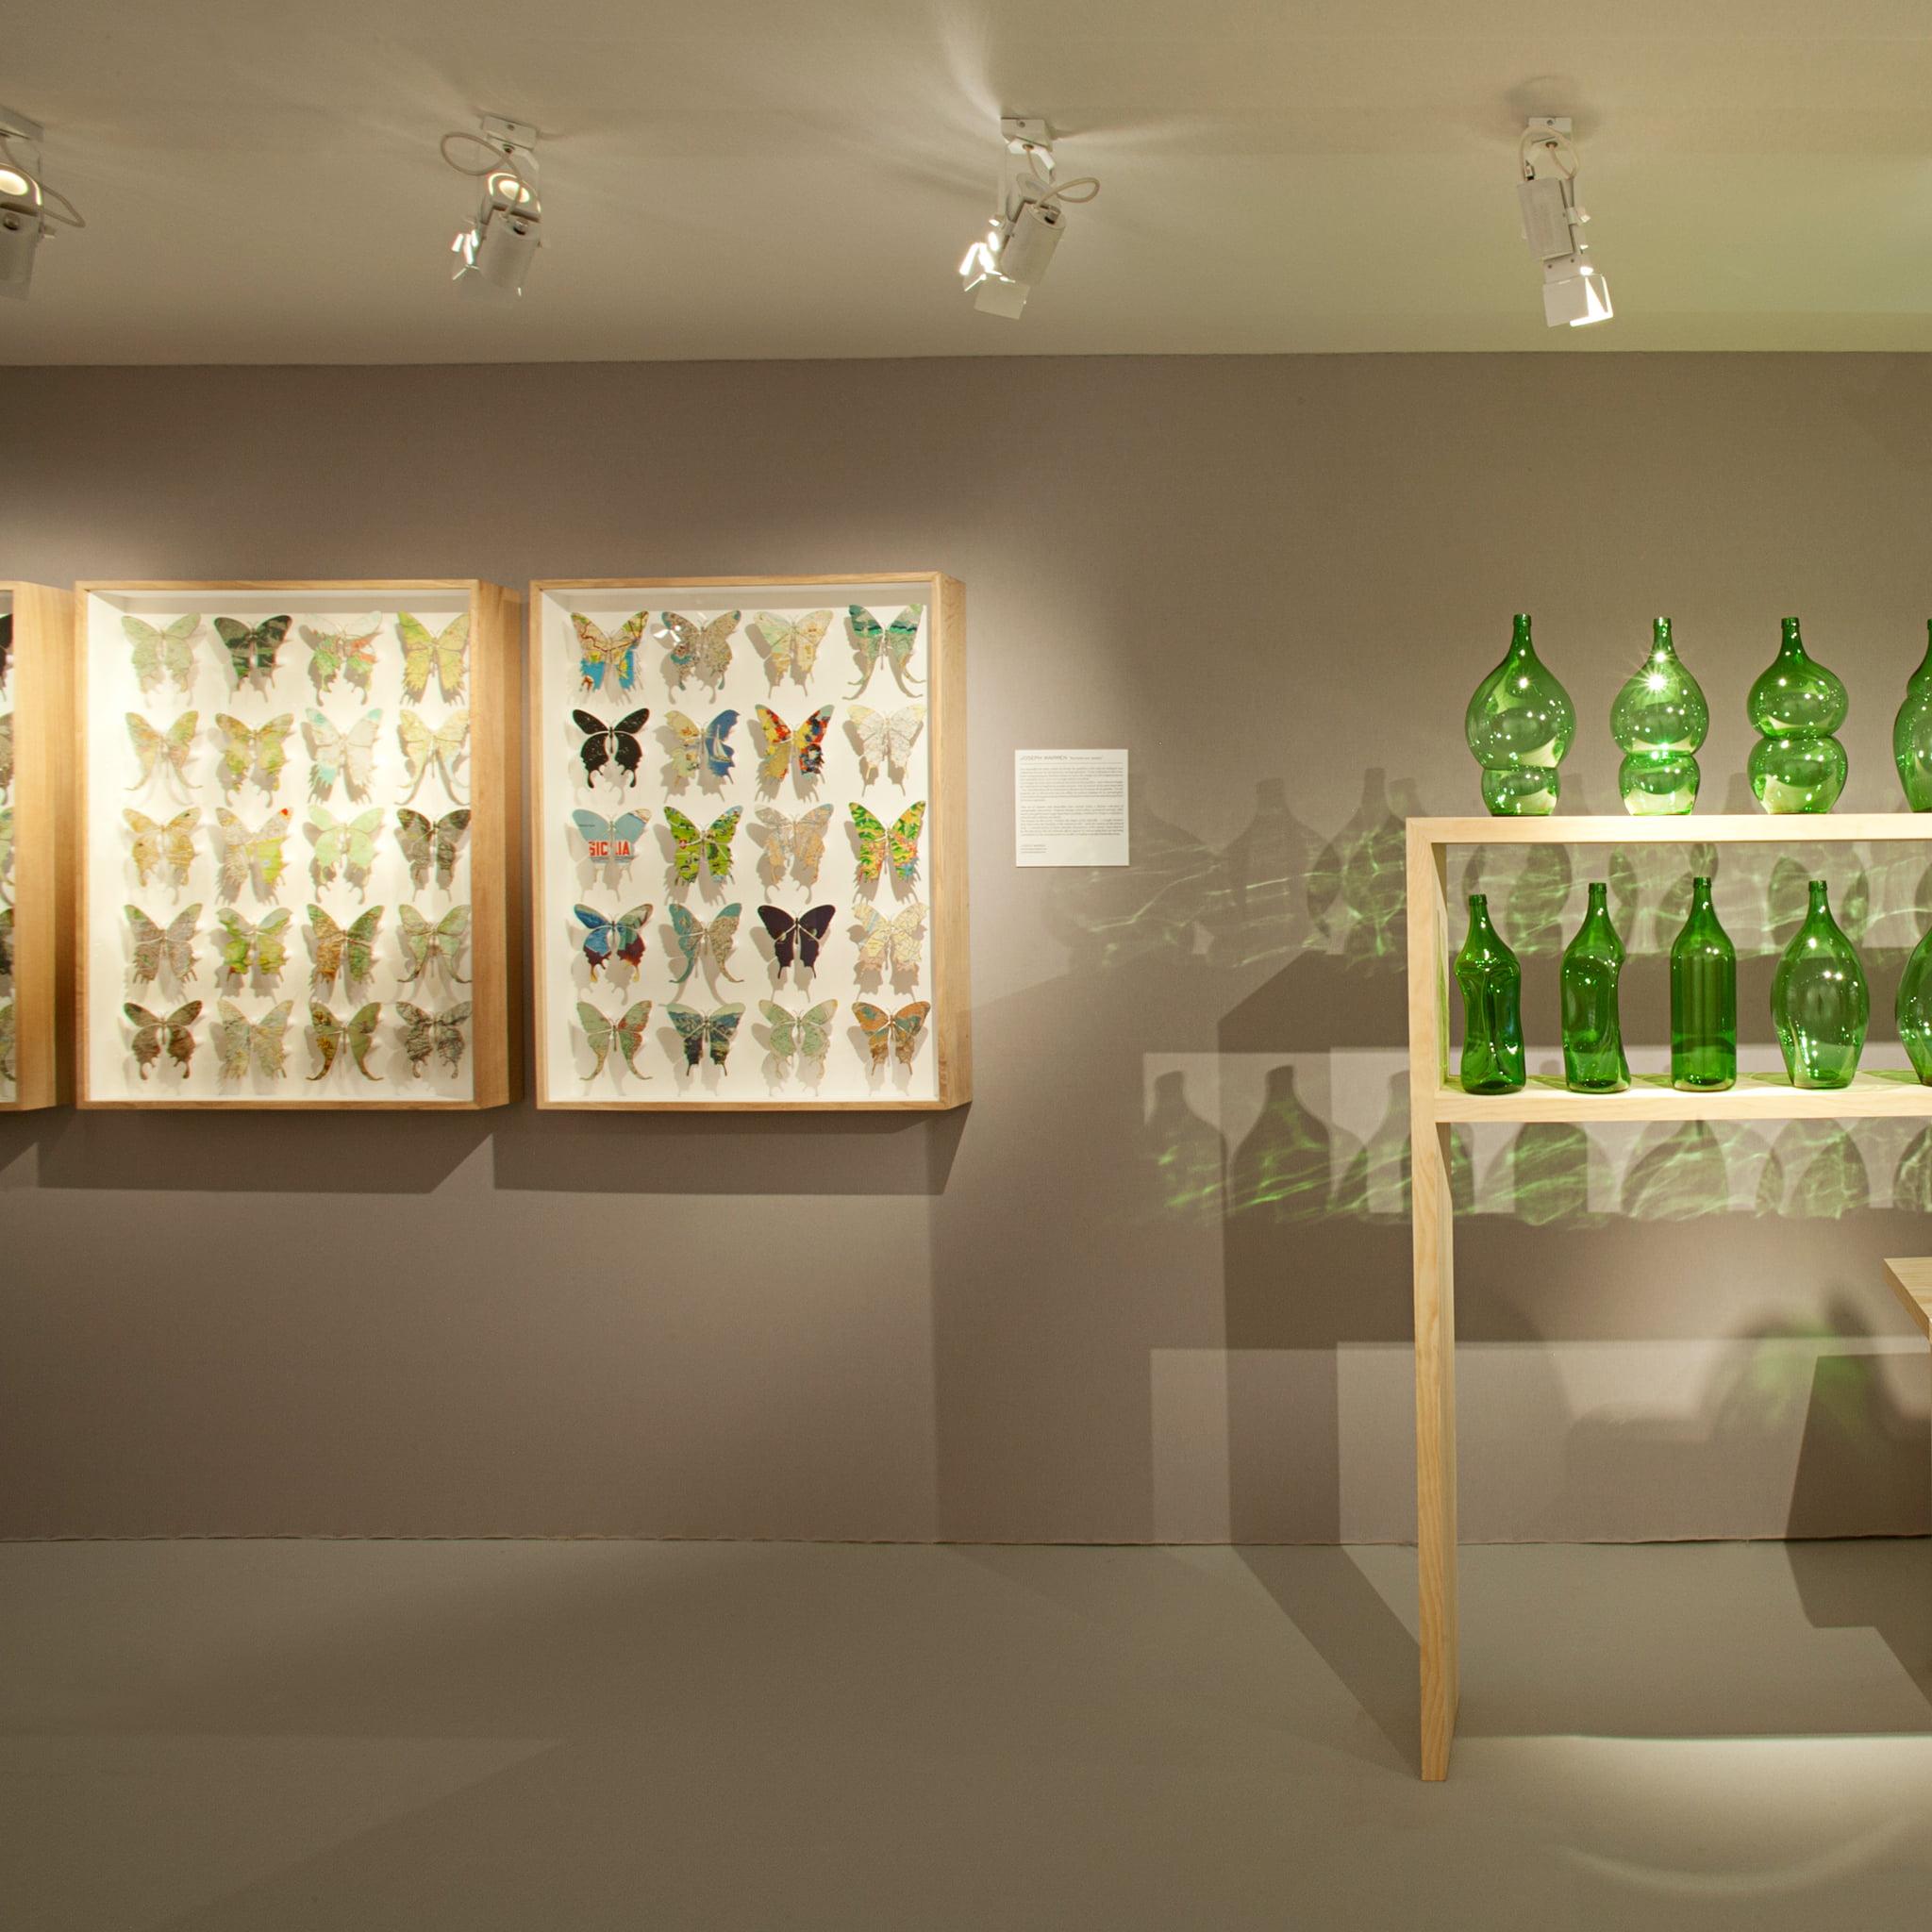 Maison-et-Objet-2011-Paris-imagesurgery-butterfly-art-1